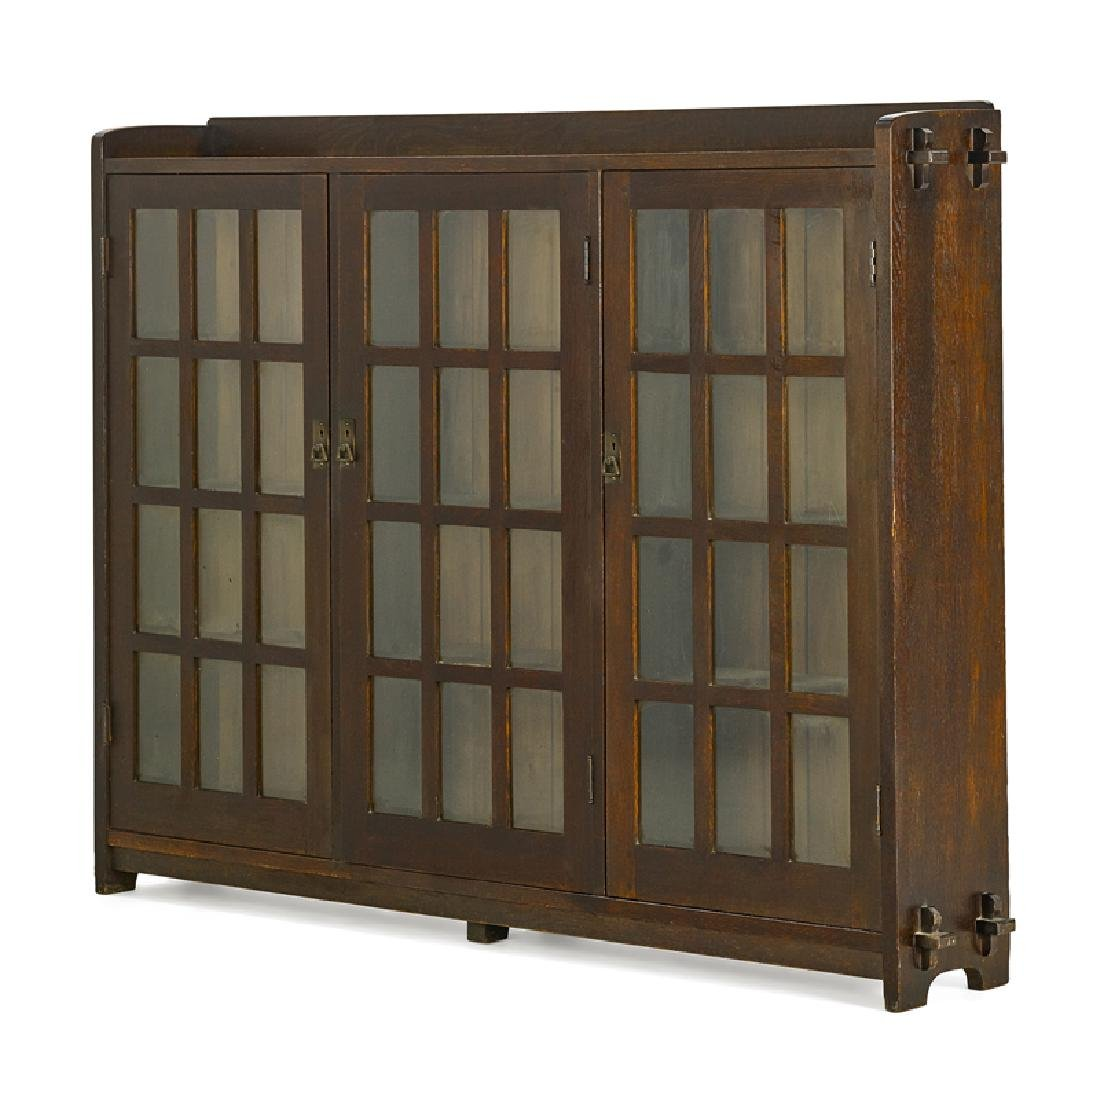 L. & J.G. STICKLEY Triple-door bookcase